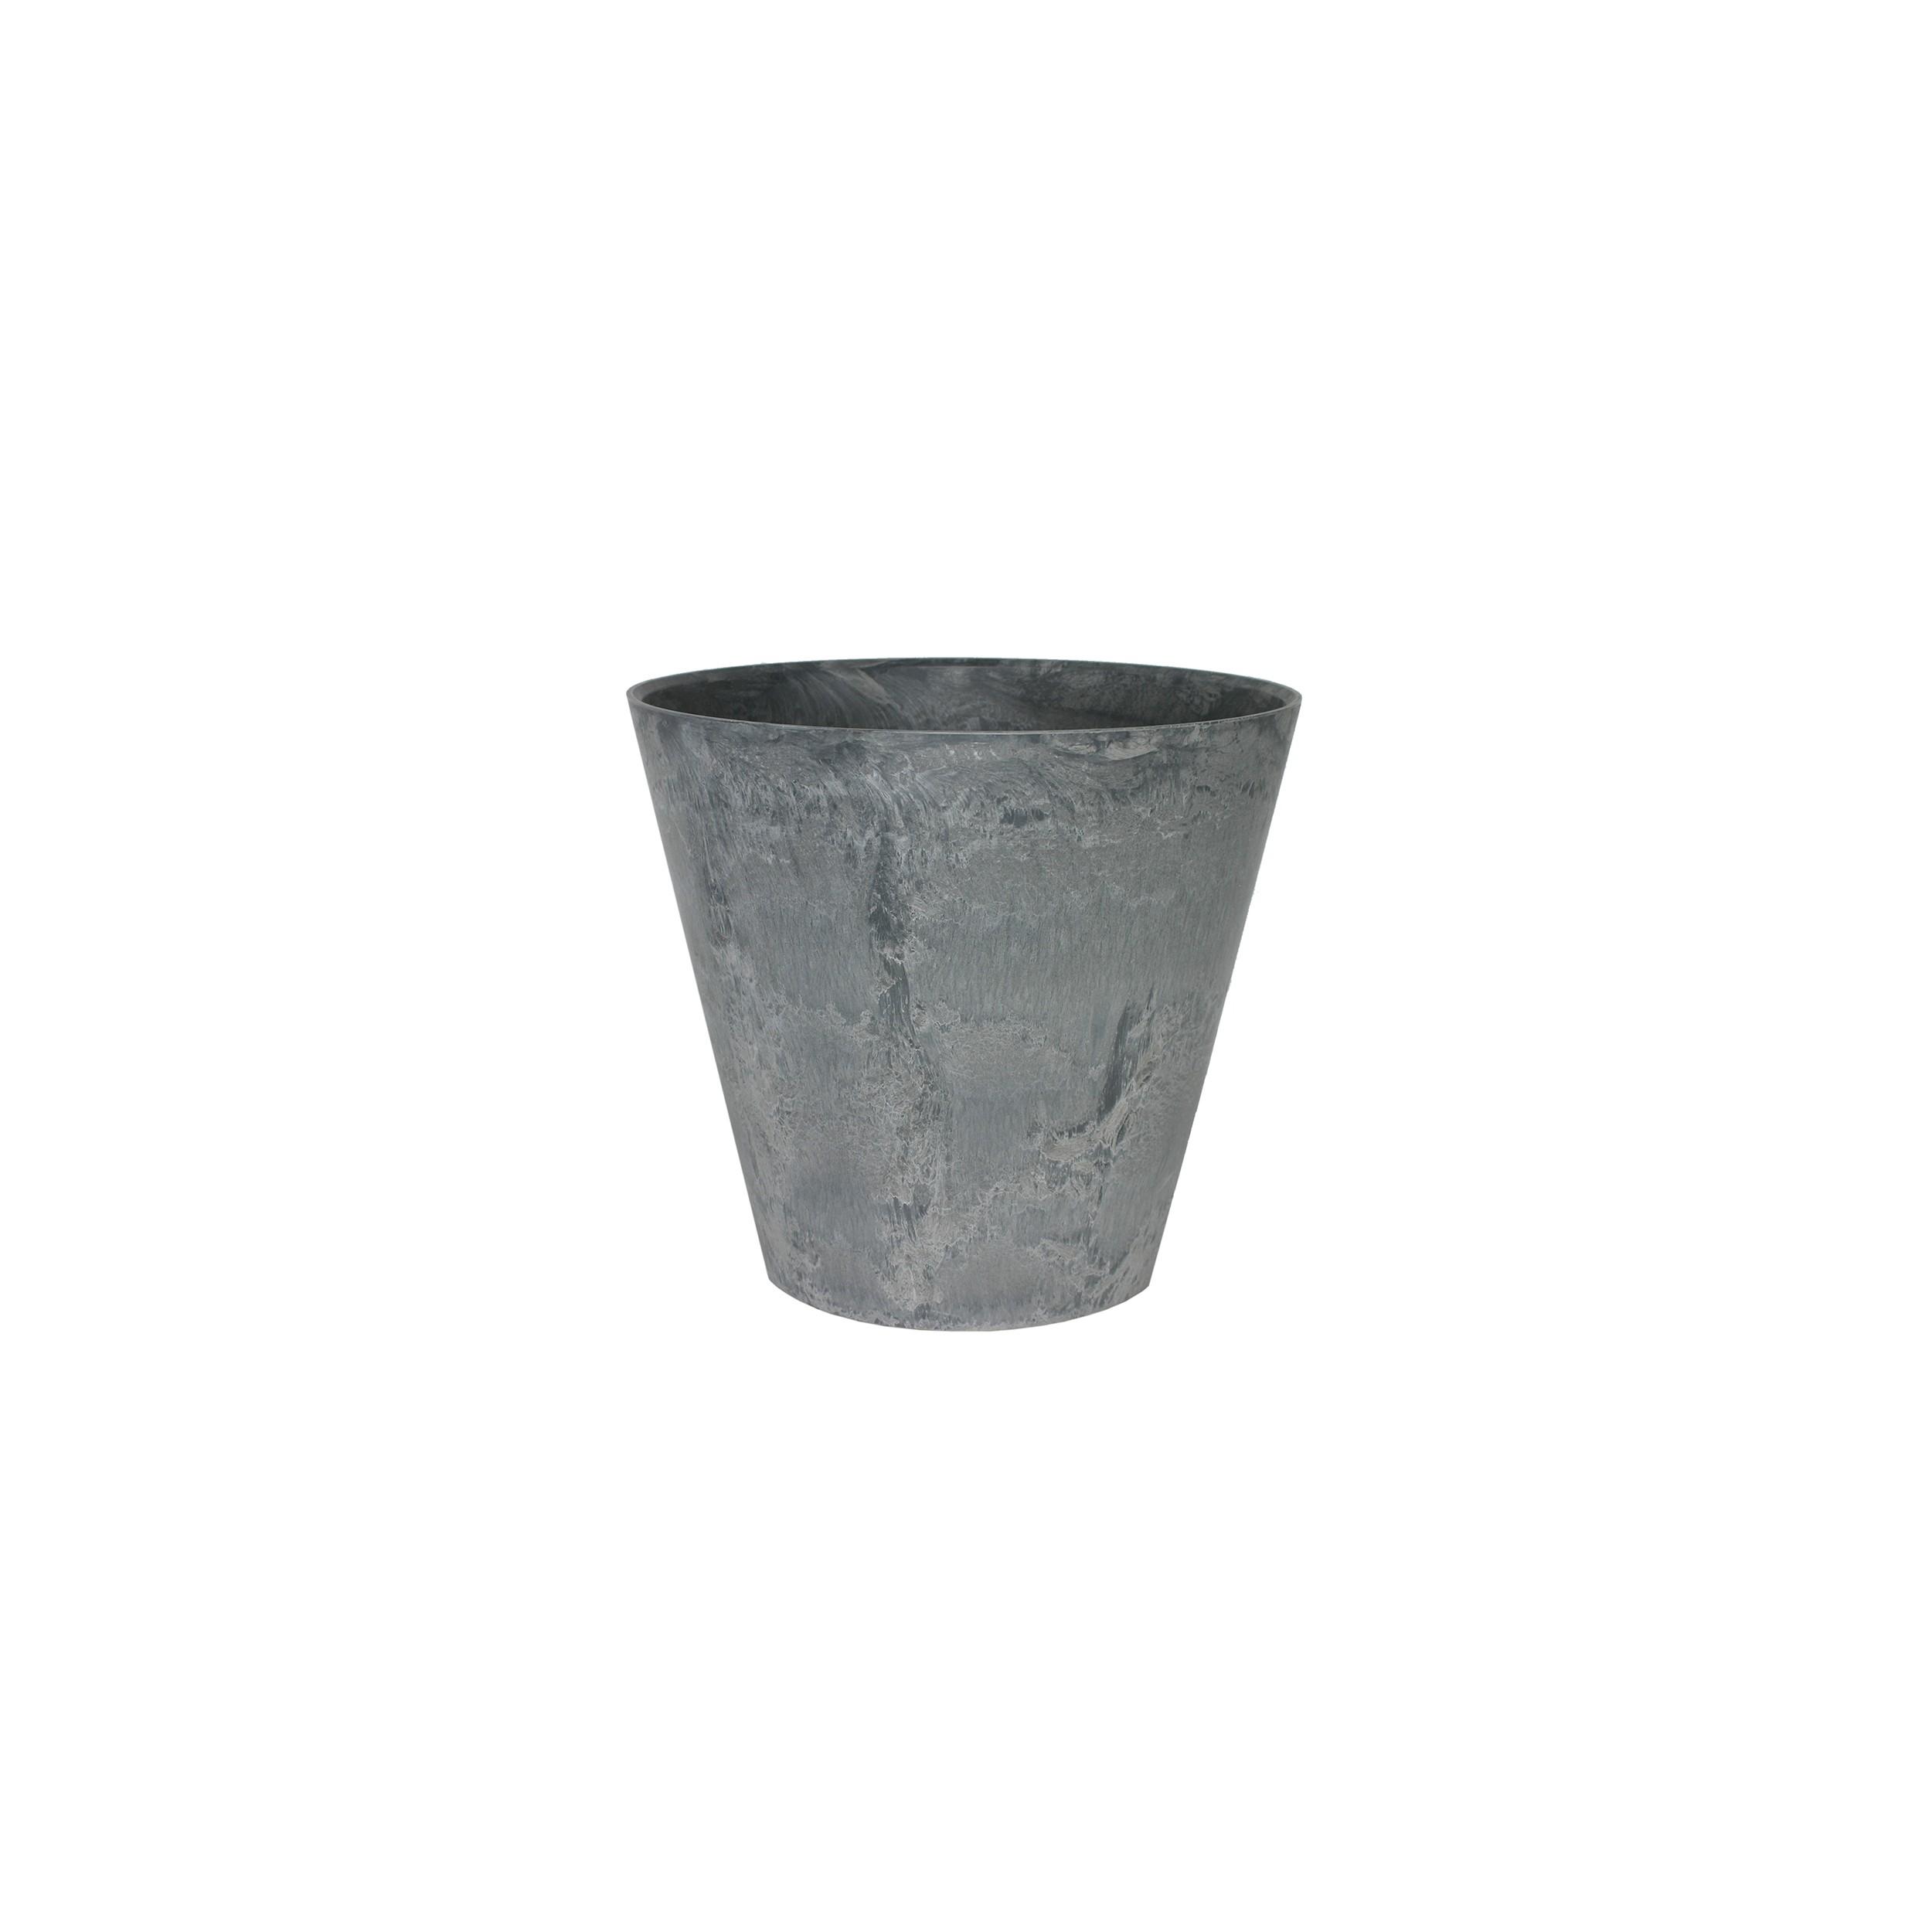 Blumentopf claire d17cm for Blumentopf grau